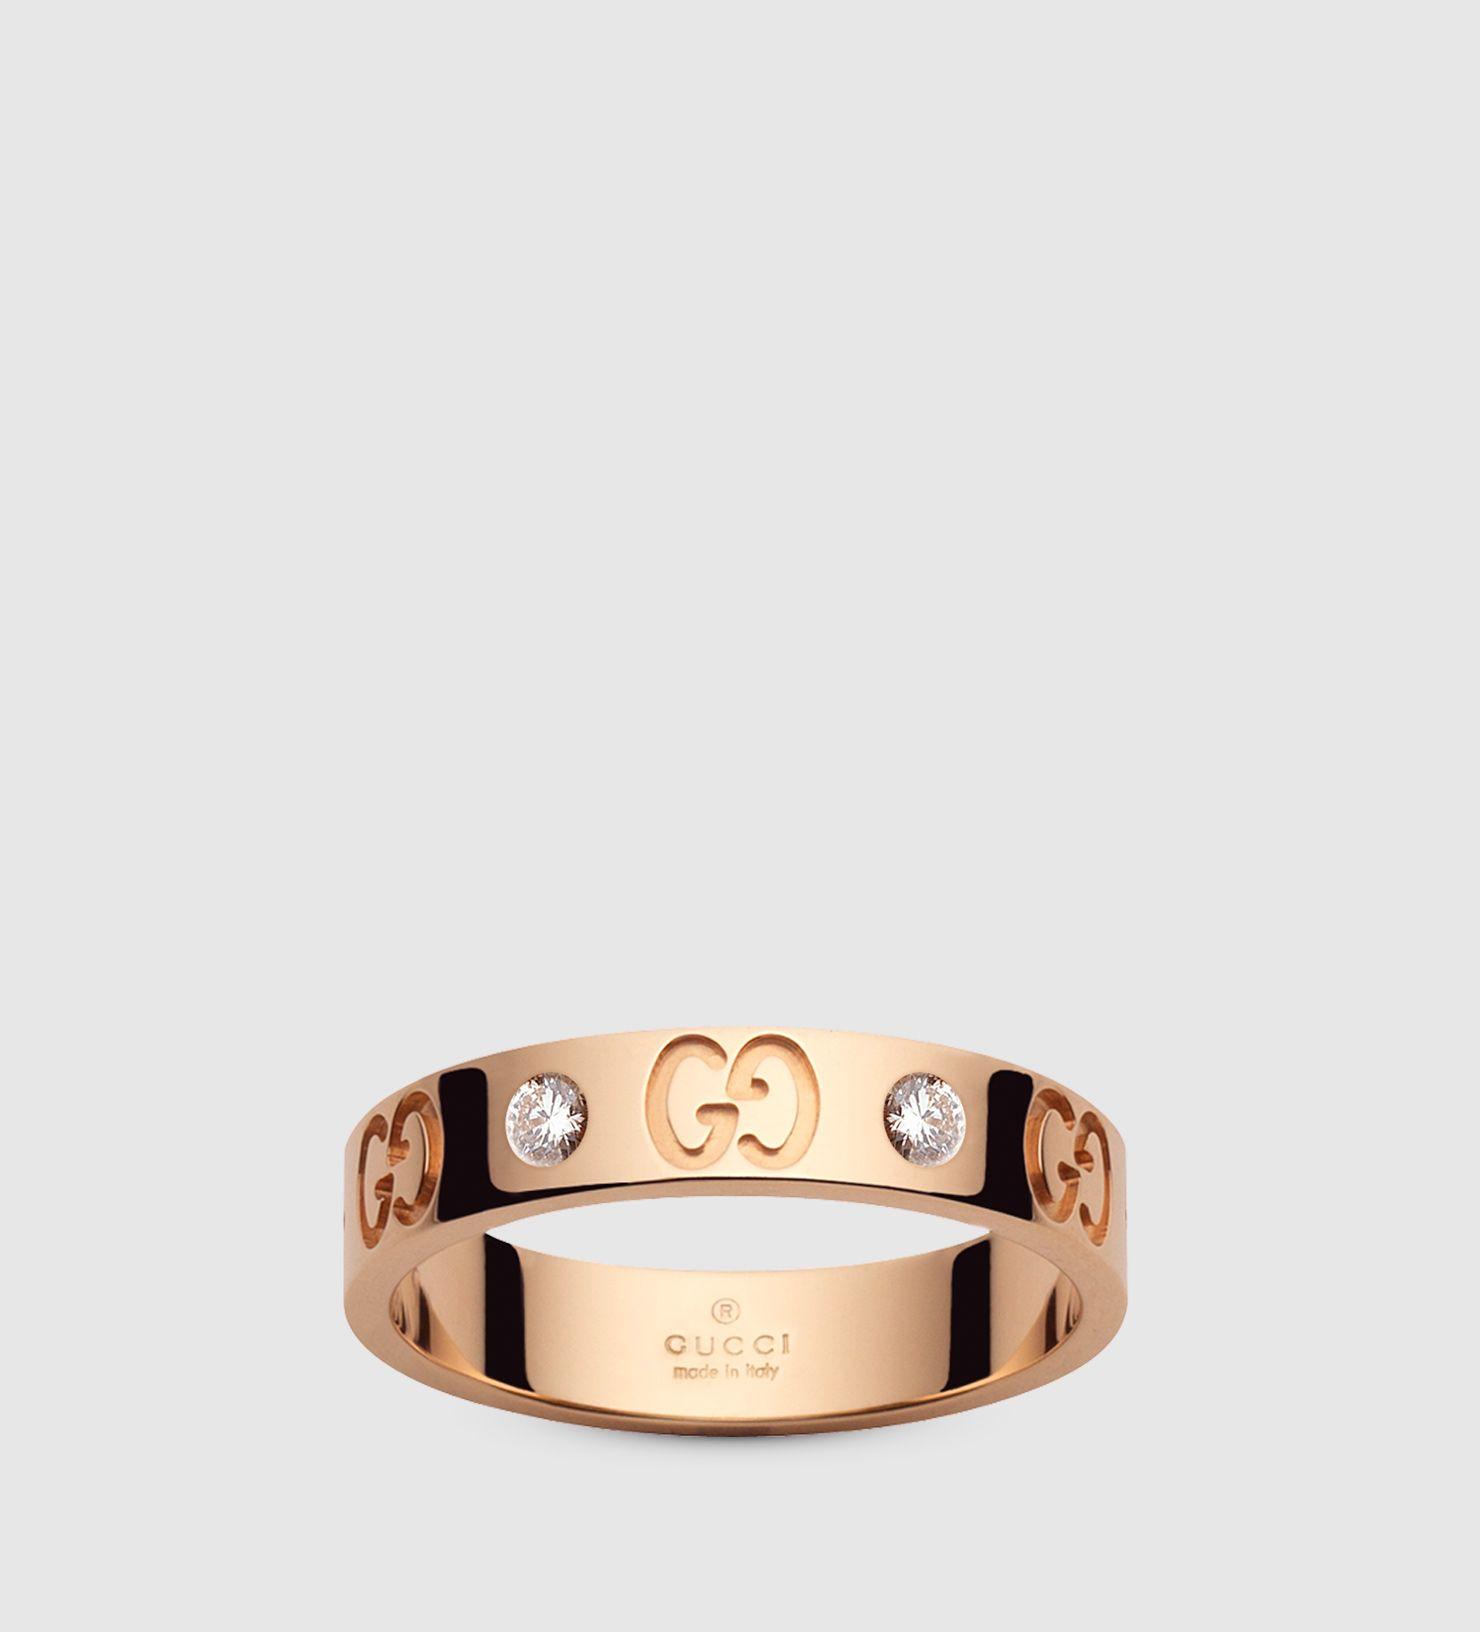 48ea287c8 「ピンクゴールド アイコンリング」 グッチの結婚指輪・マリッジリングの一覧。